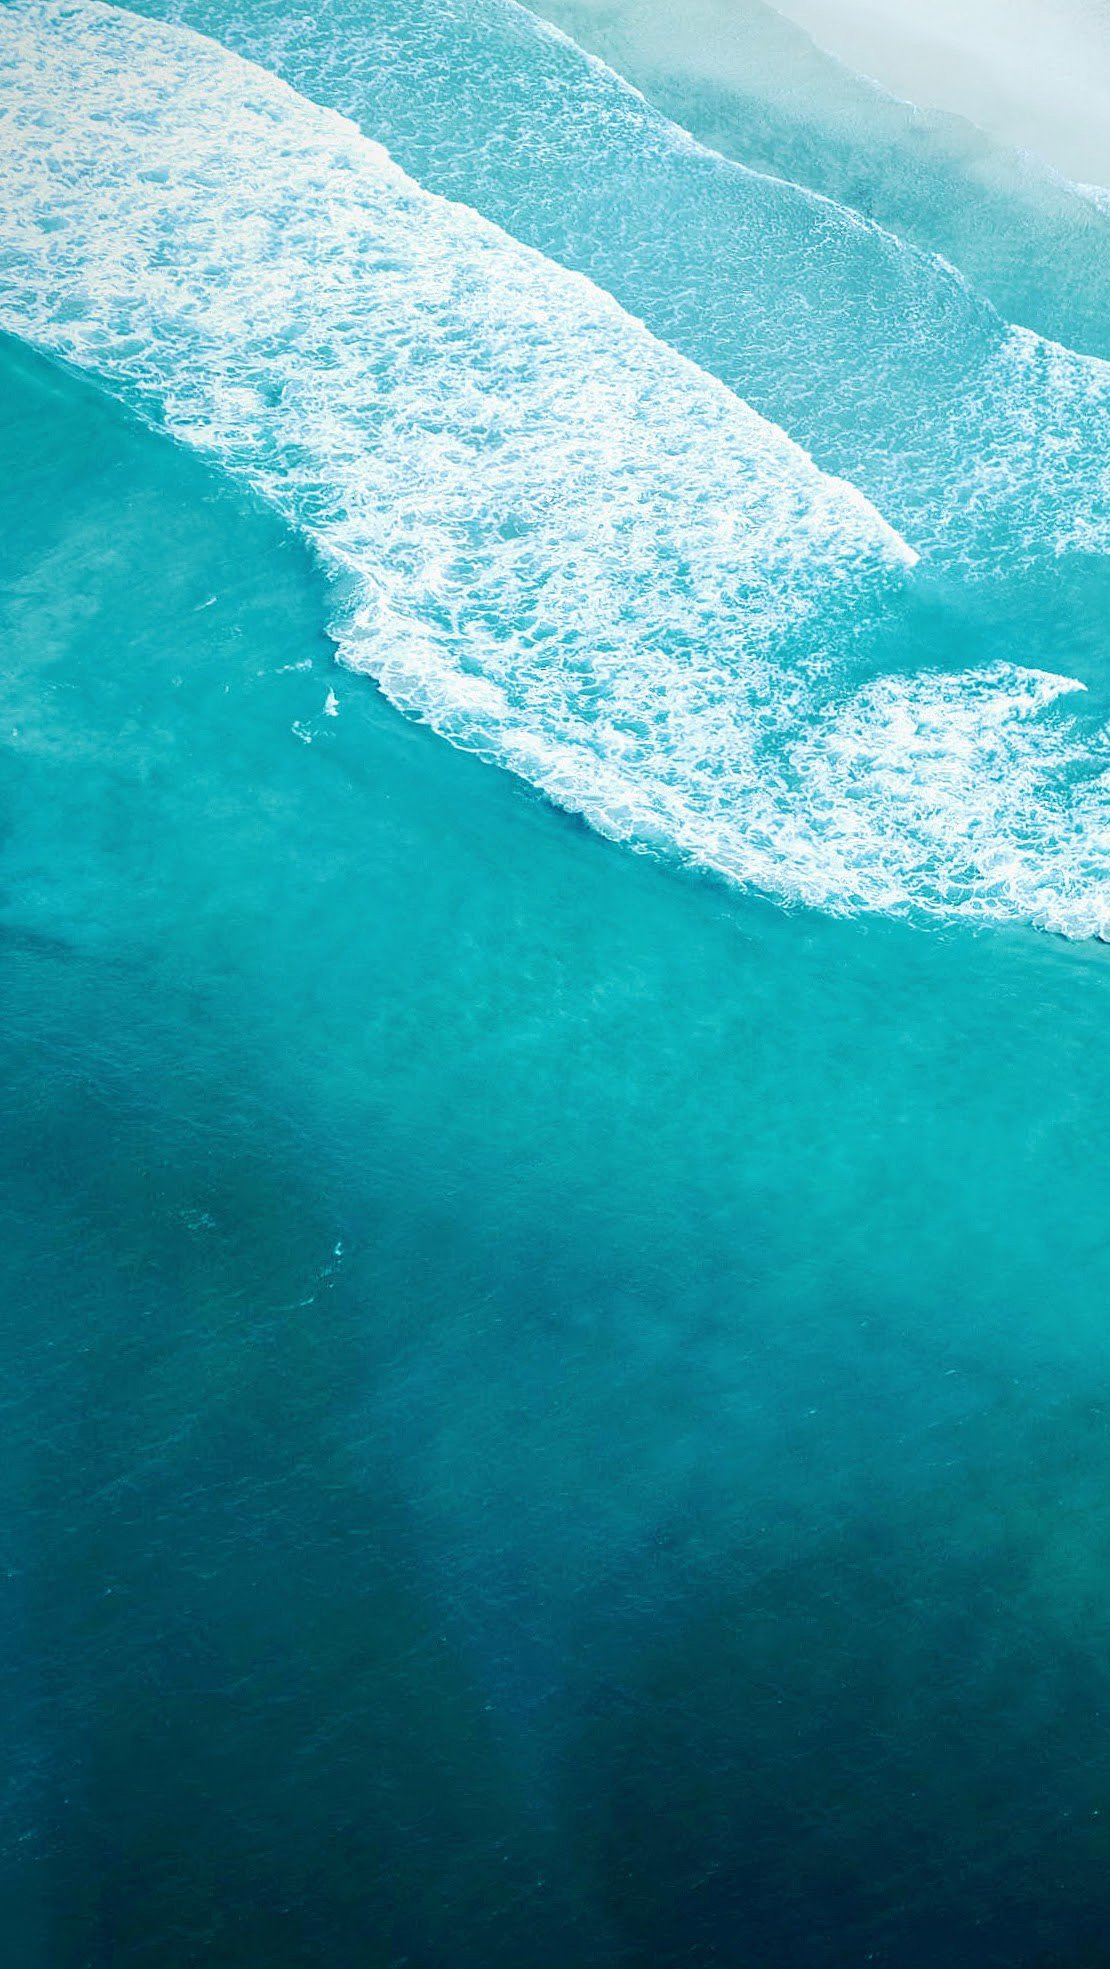 Fondos de pantalla Playa costa vista aérea Vertical